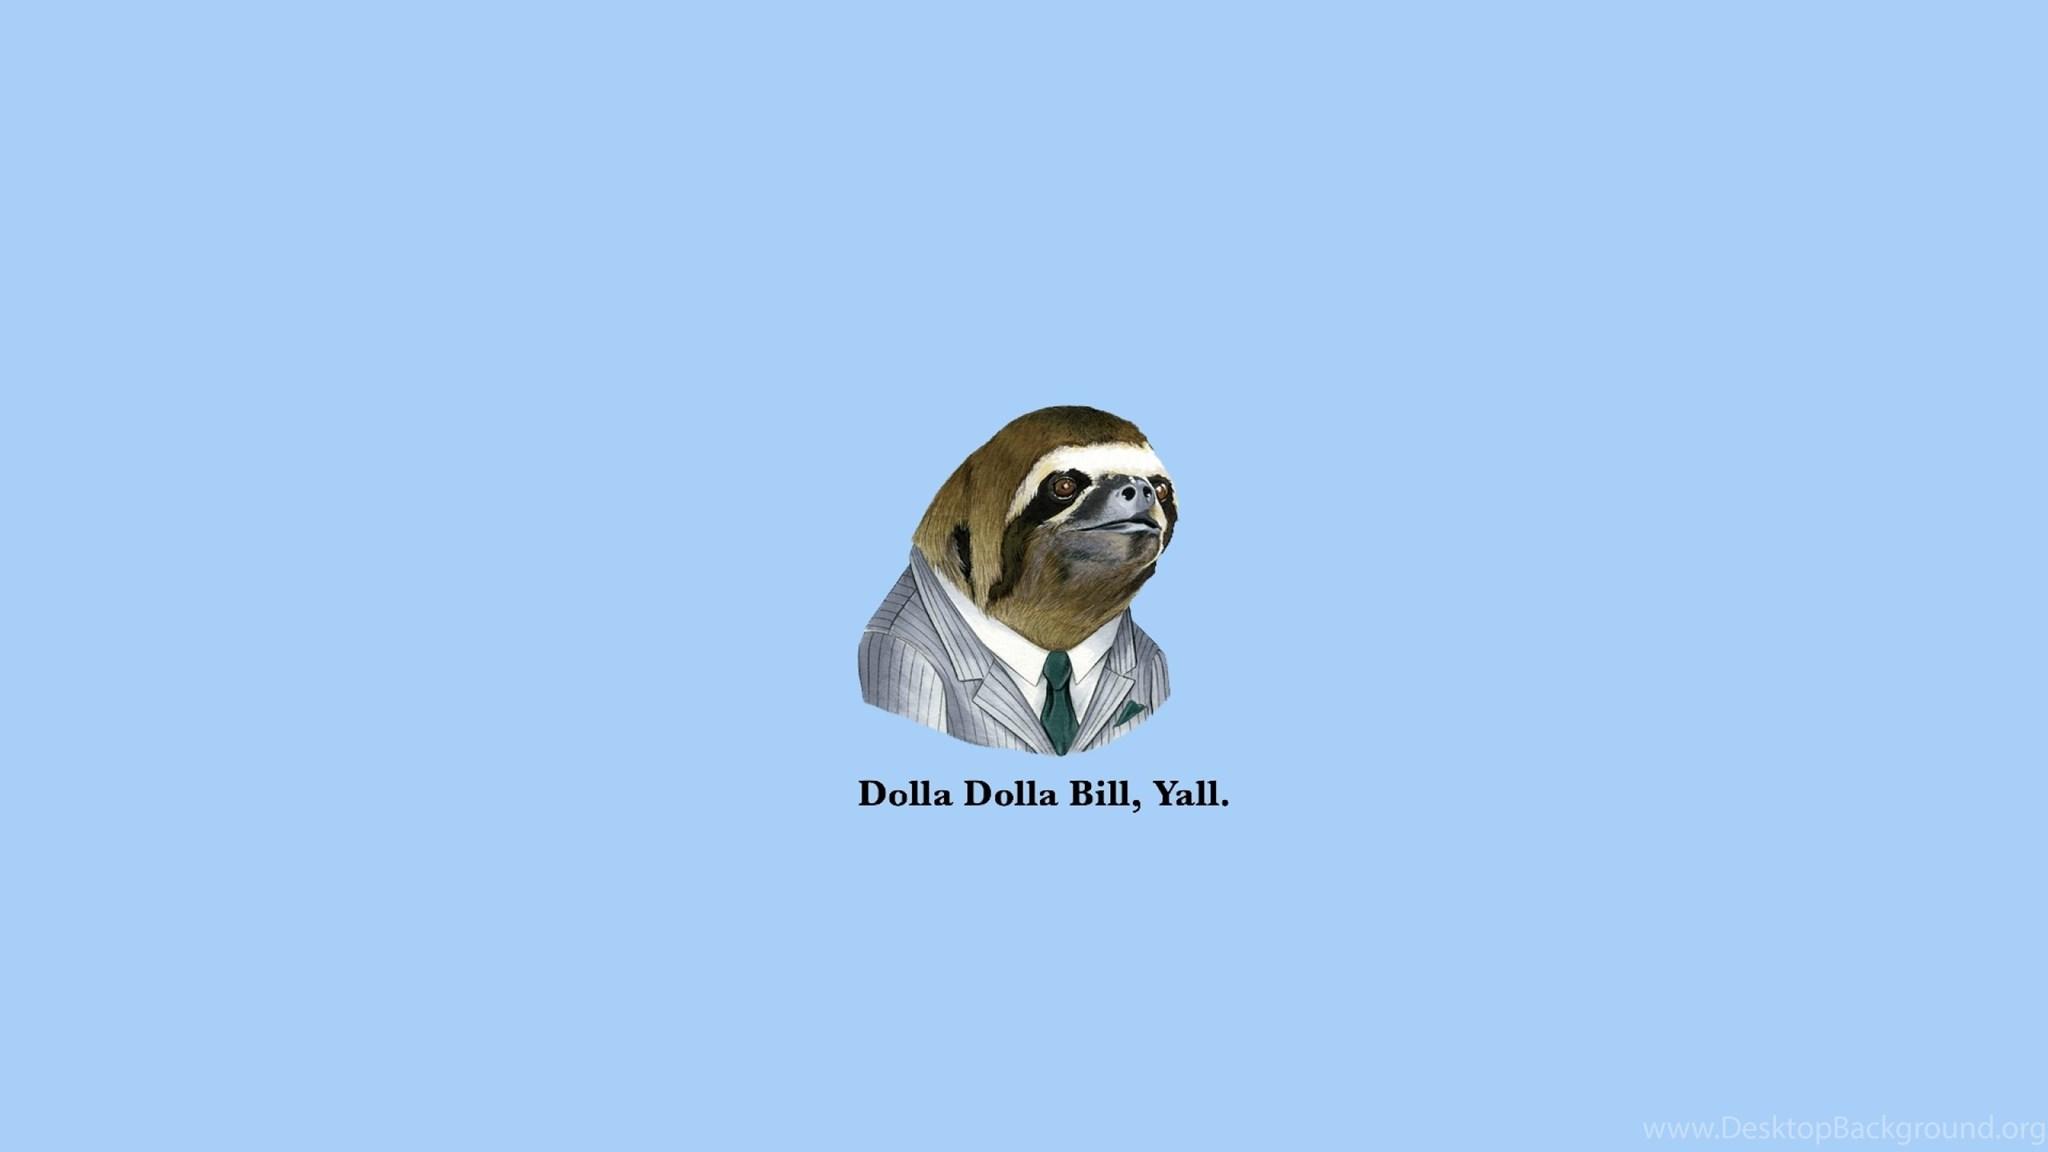 Download Wallpapers 2560x1440 Sloth Dollar Bills